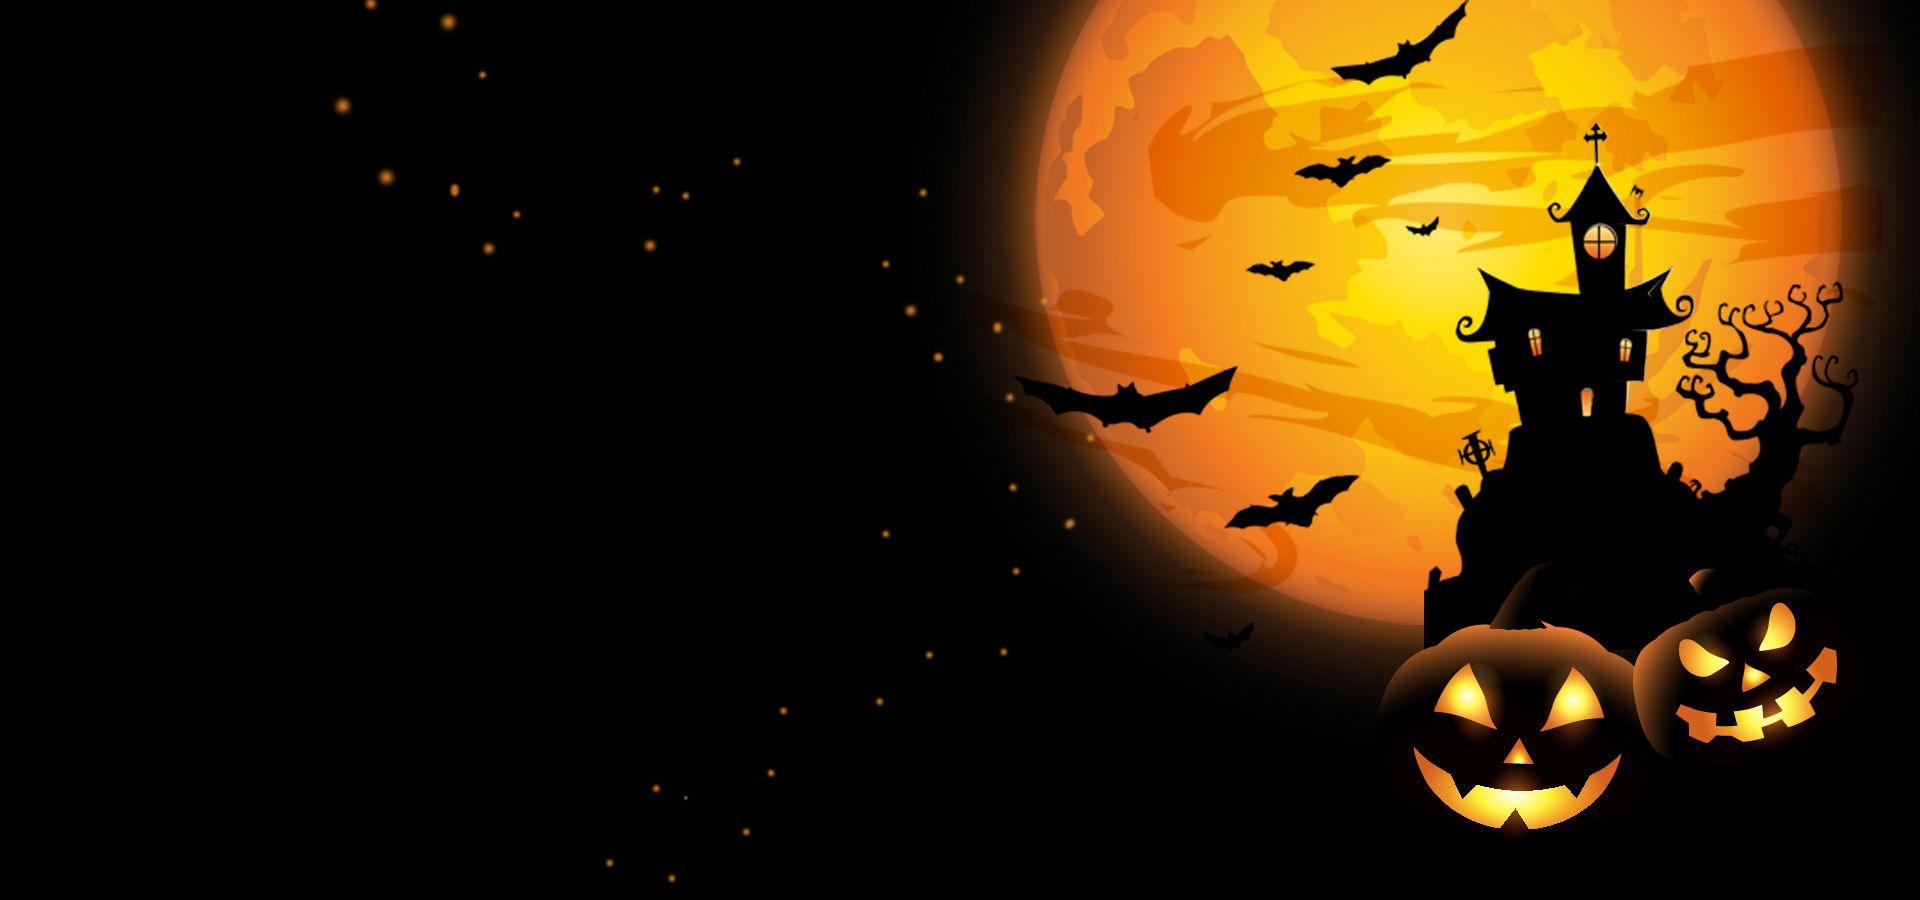 Transparent Halloween Halloween Backgrounds Halloween Facebook Cover Background Images